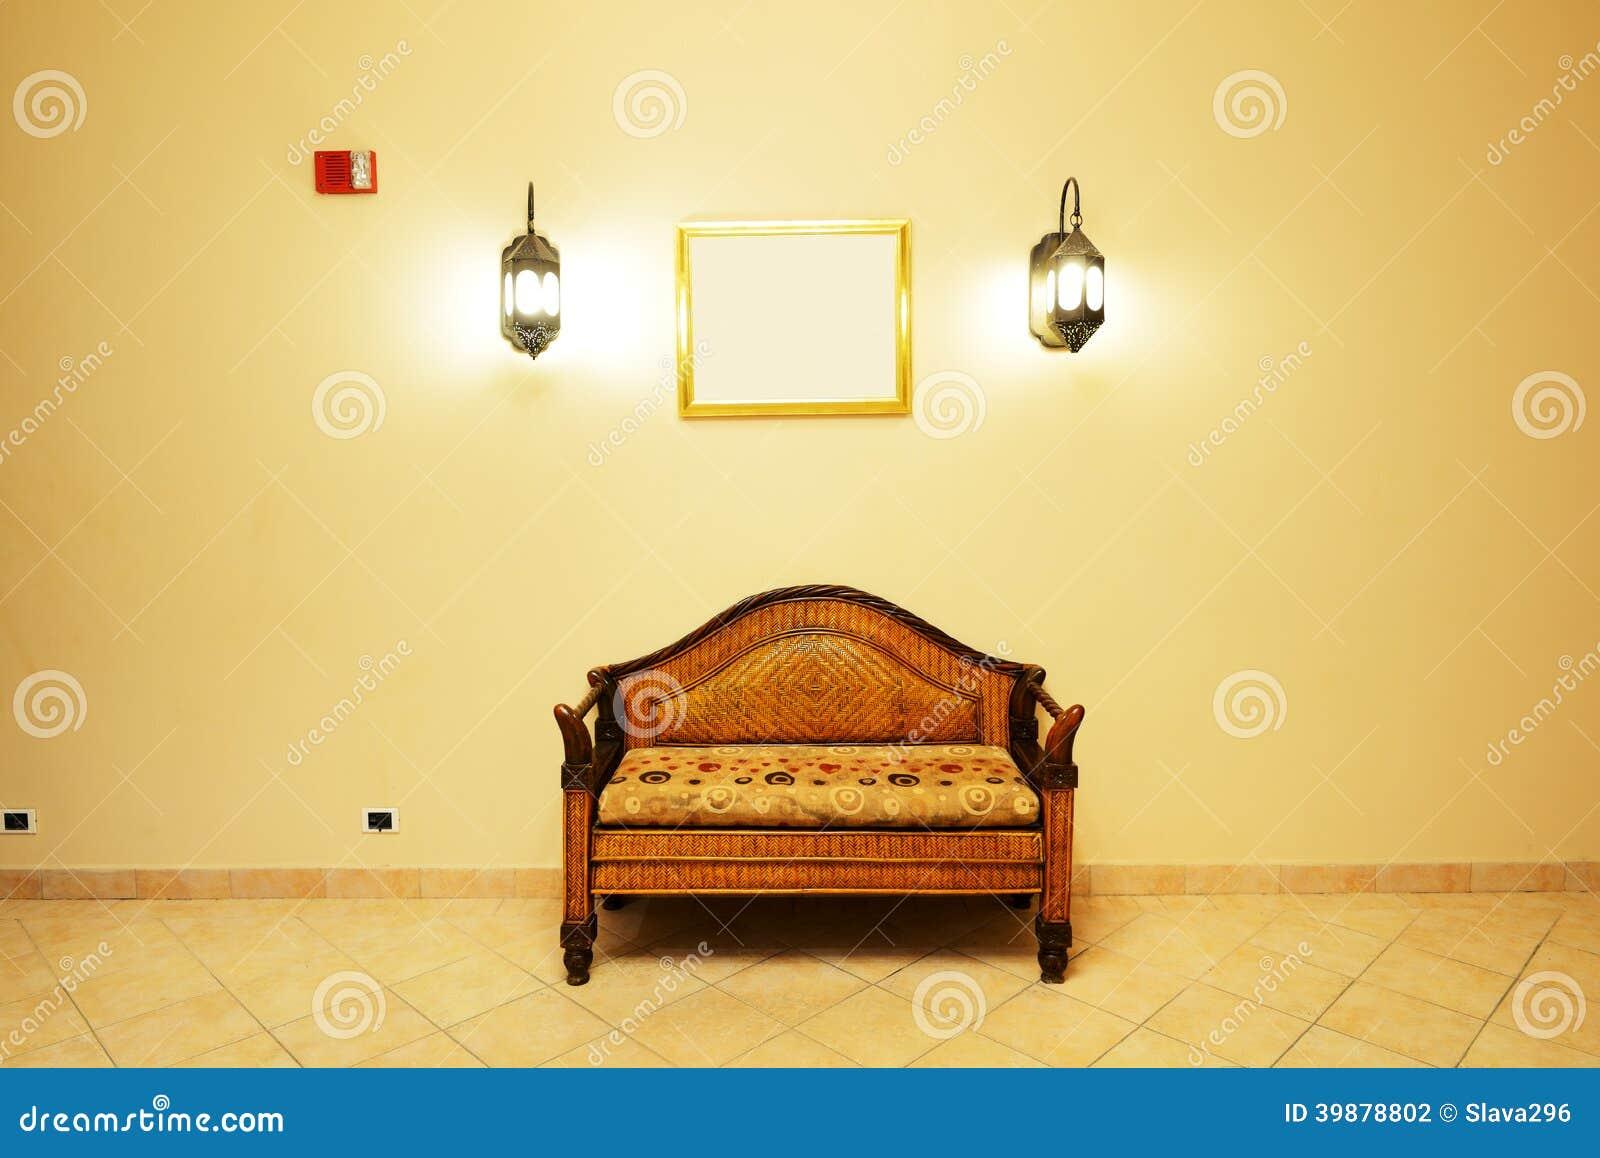 Lobby interior of the luxury hotel in night illumination